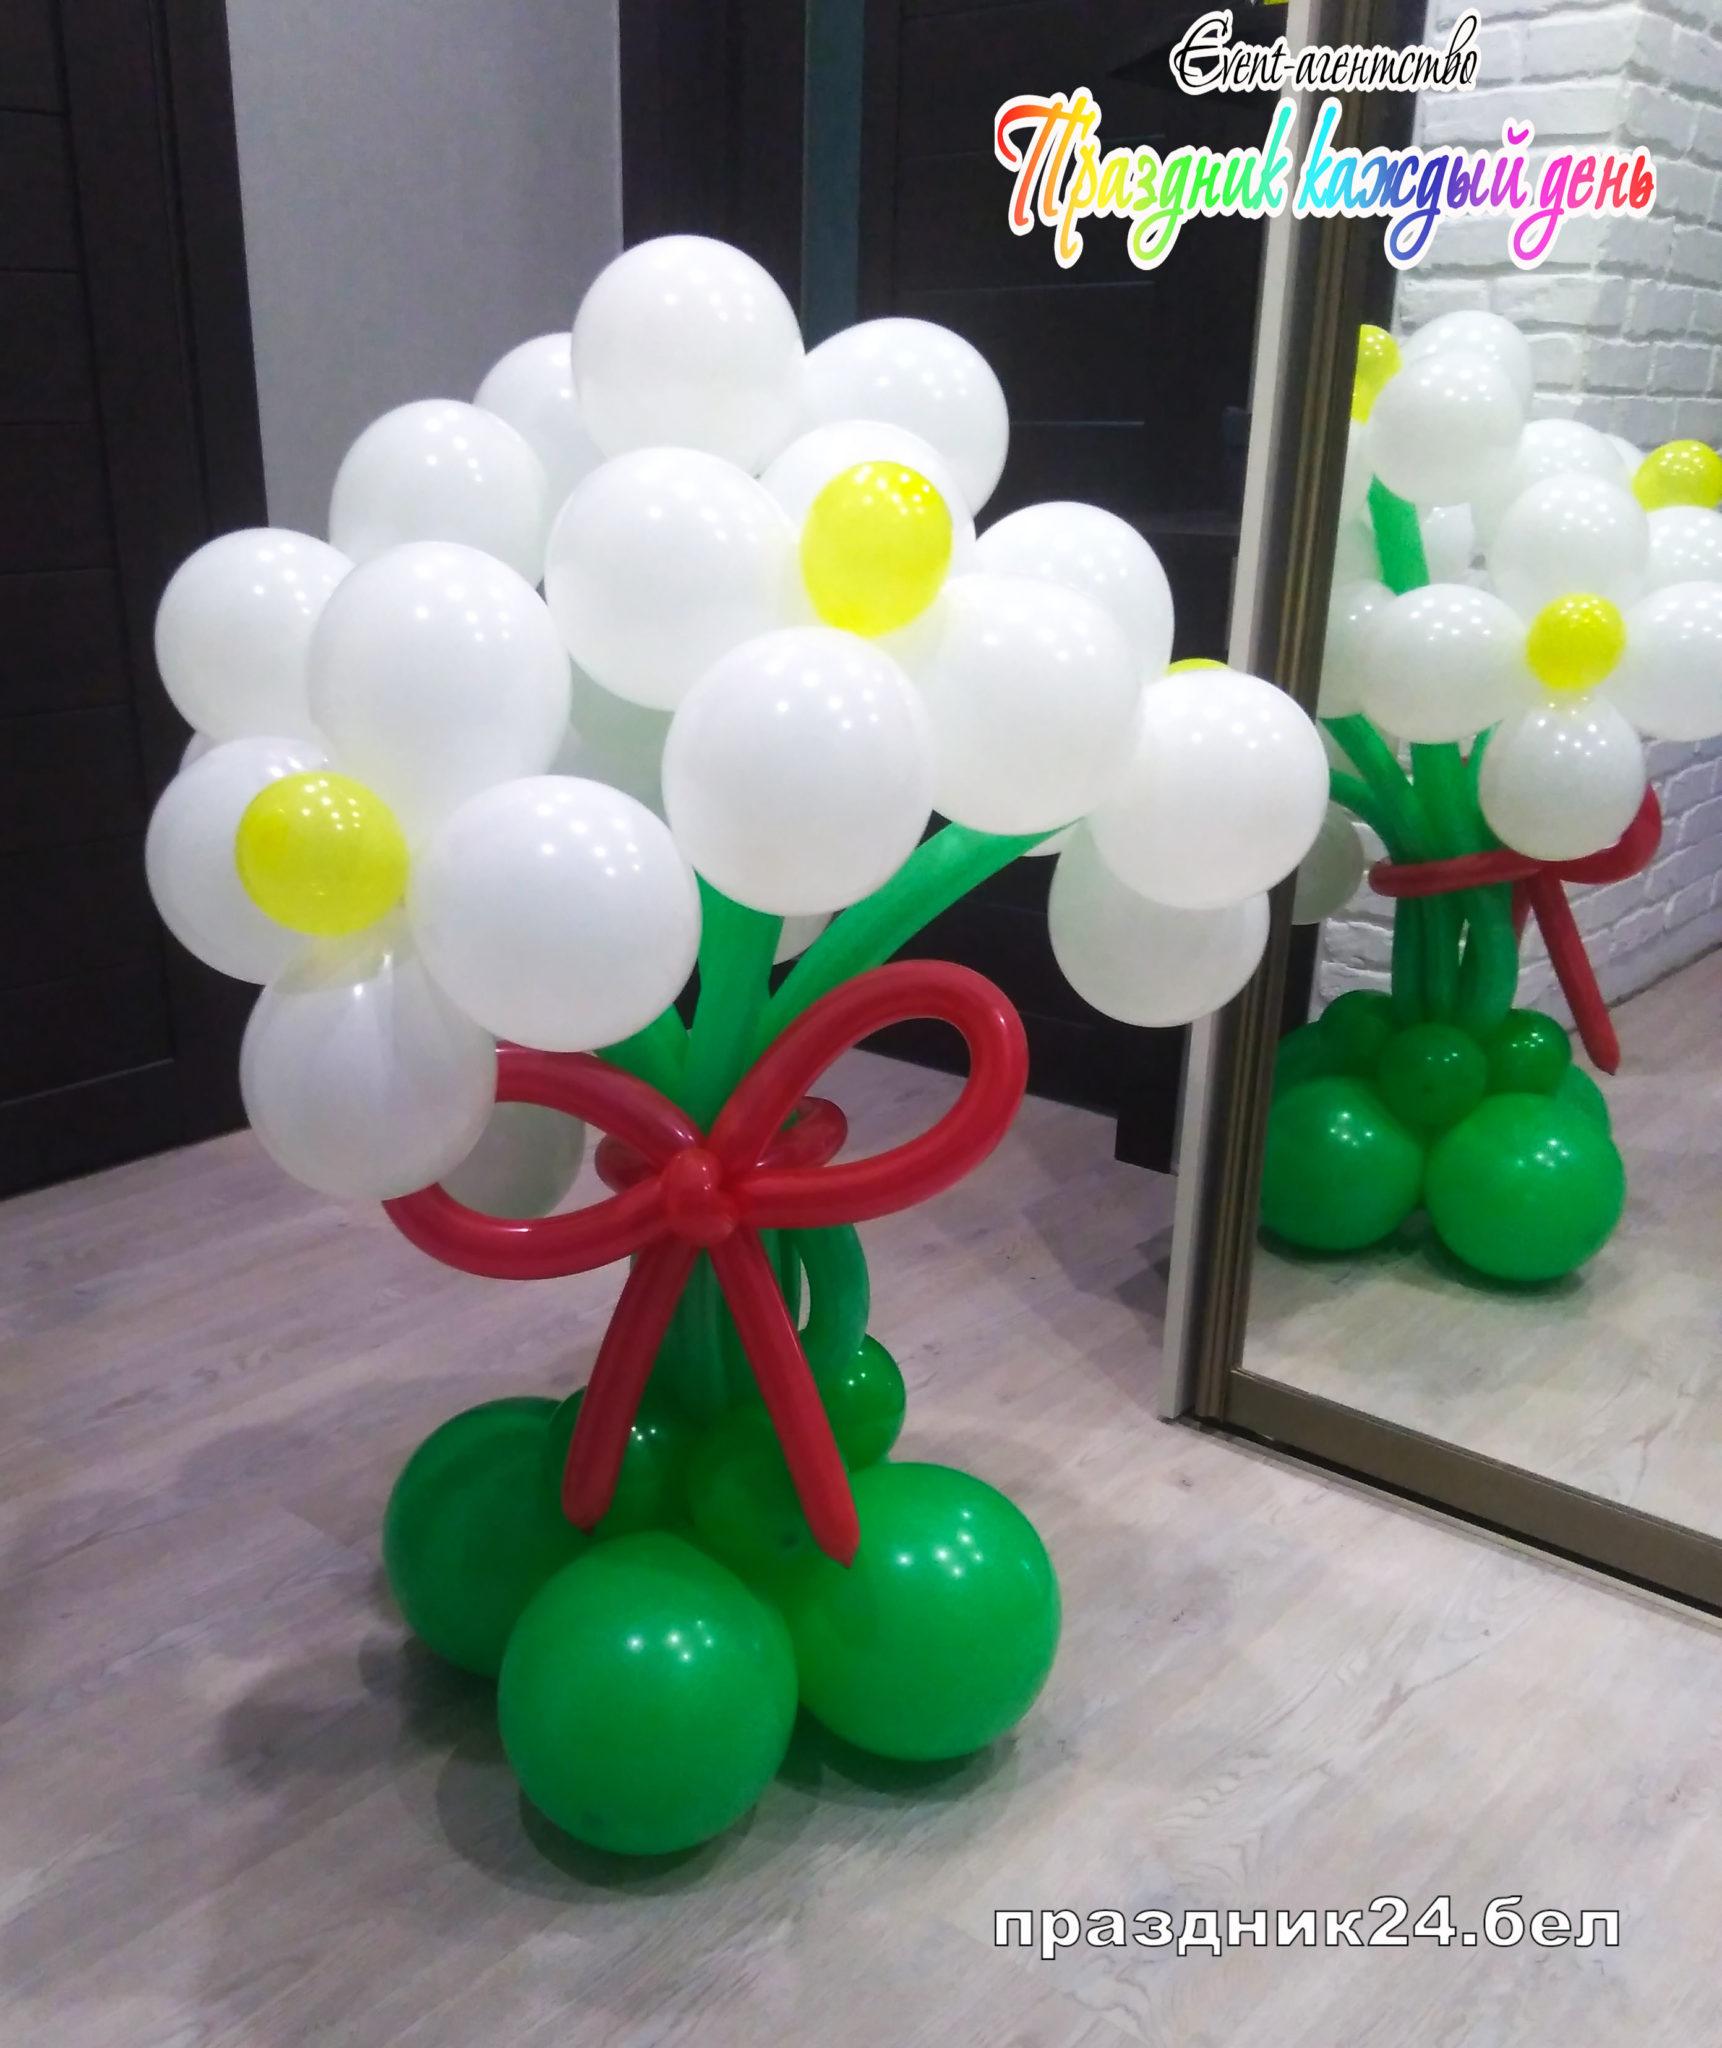 P_20191003_095937.jpg